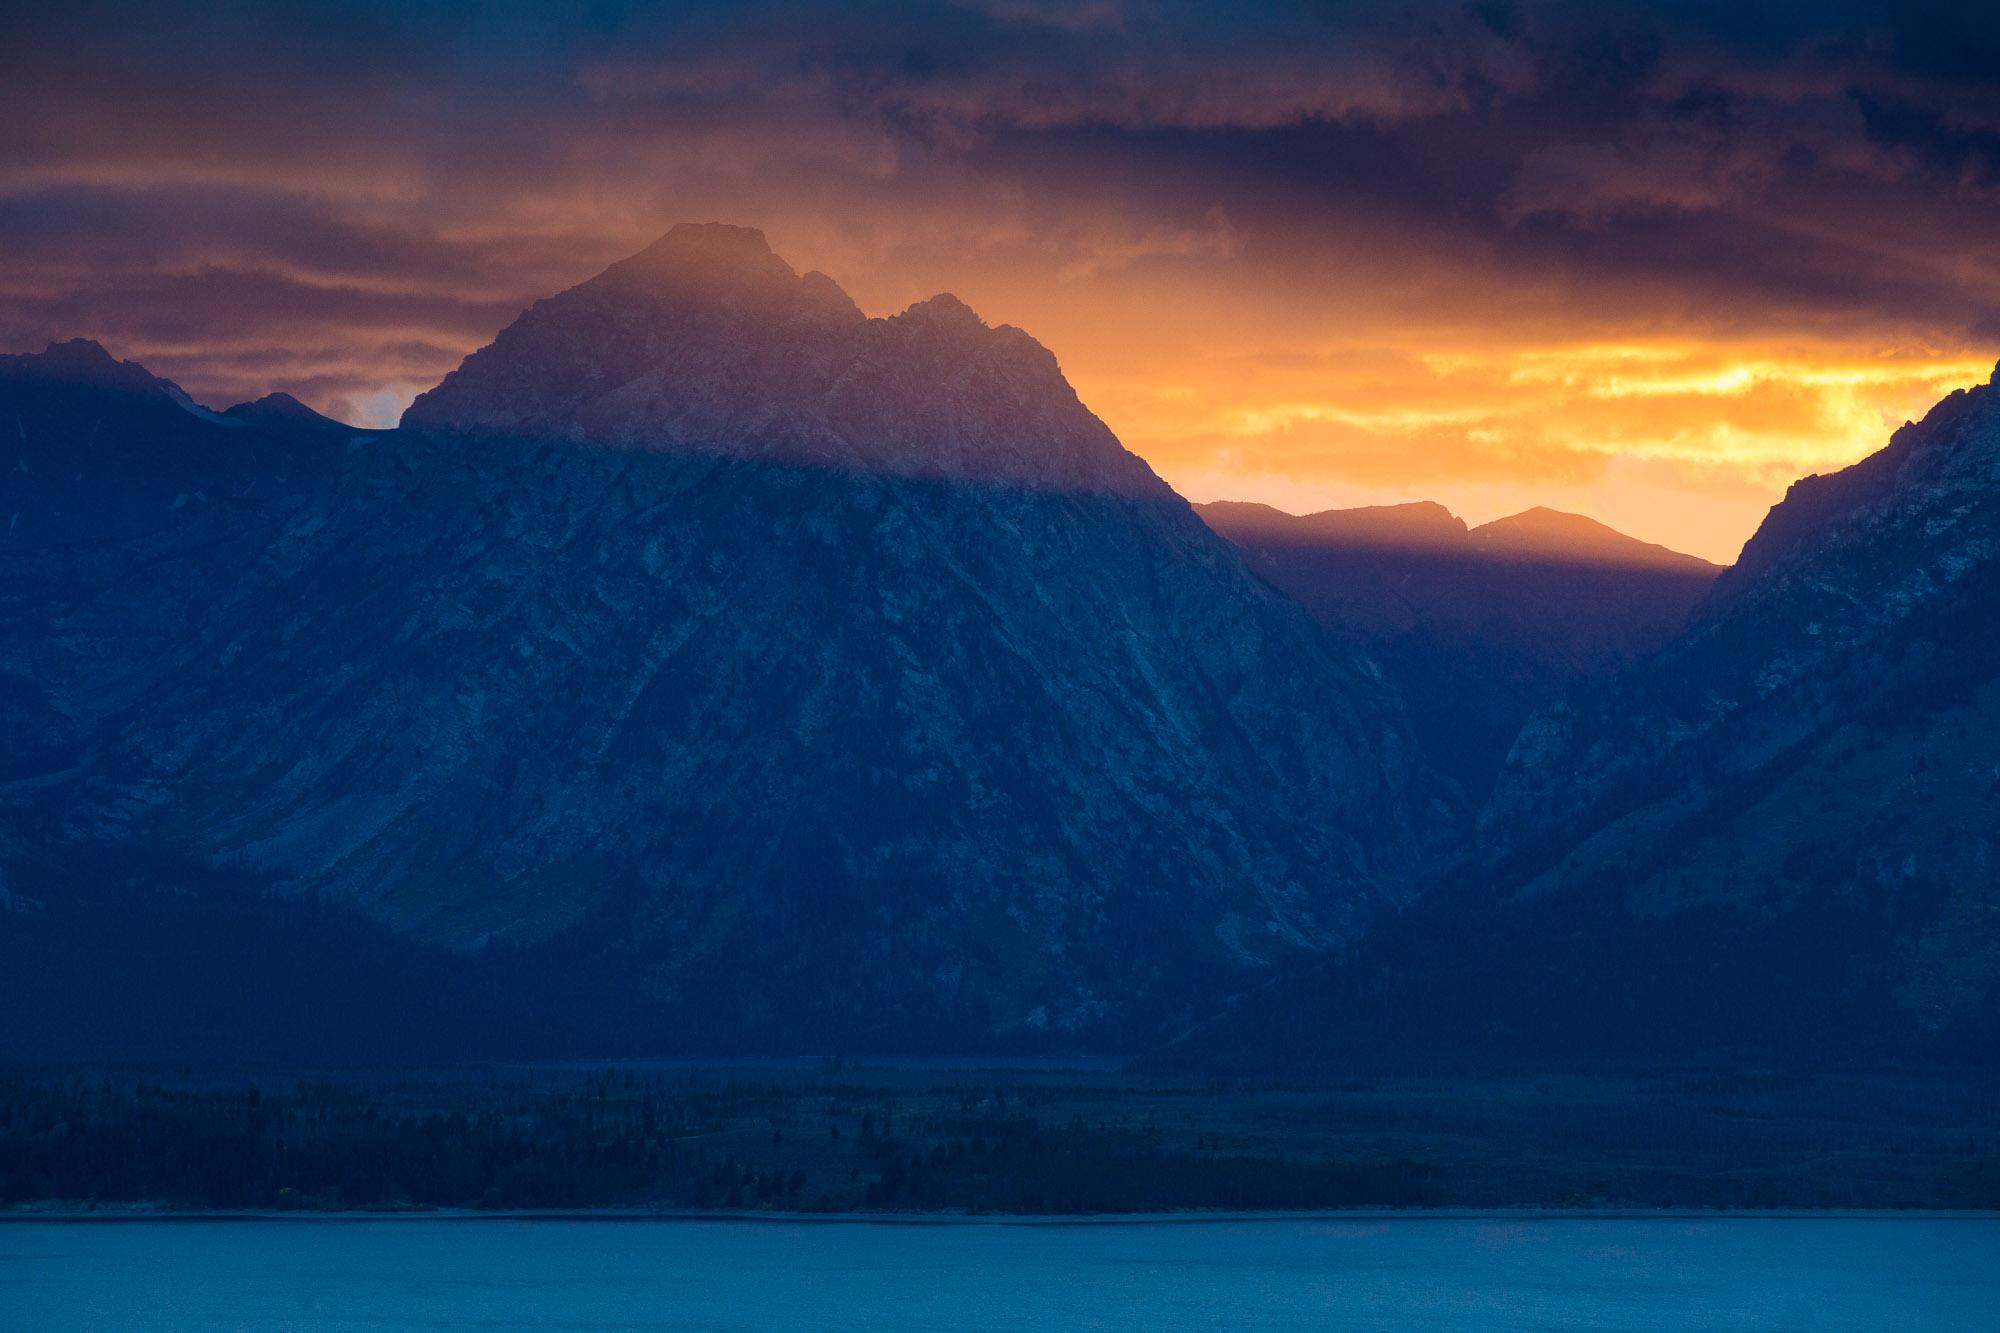 Mount Moran and Jackson Lake at sunset in Autumn